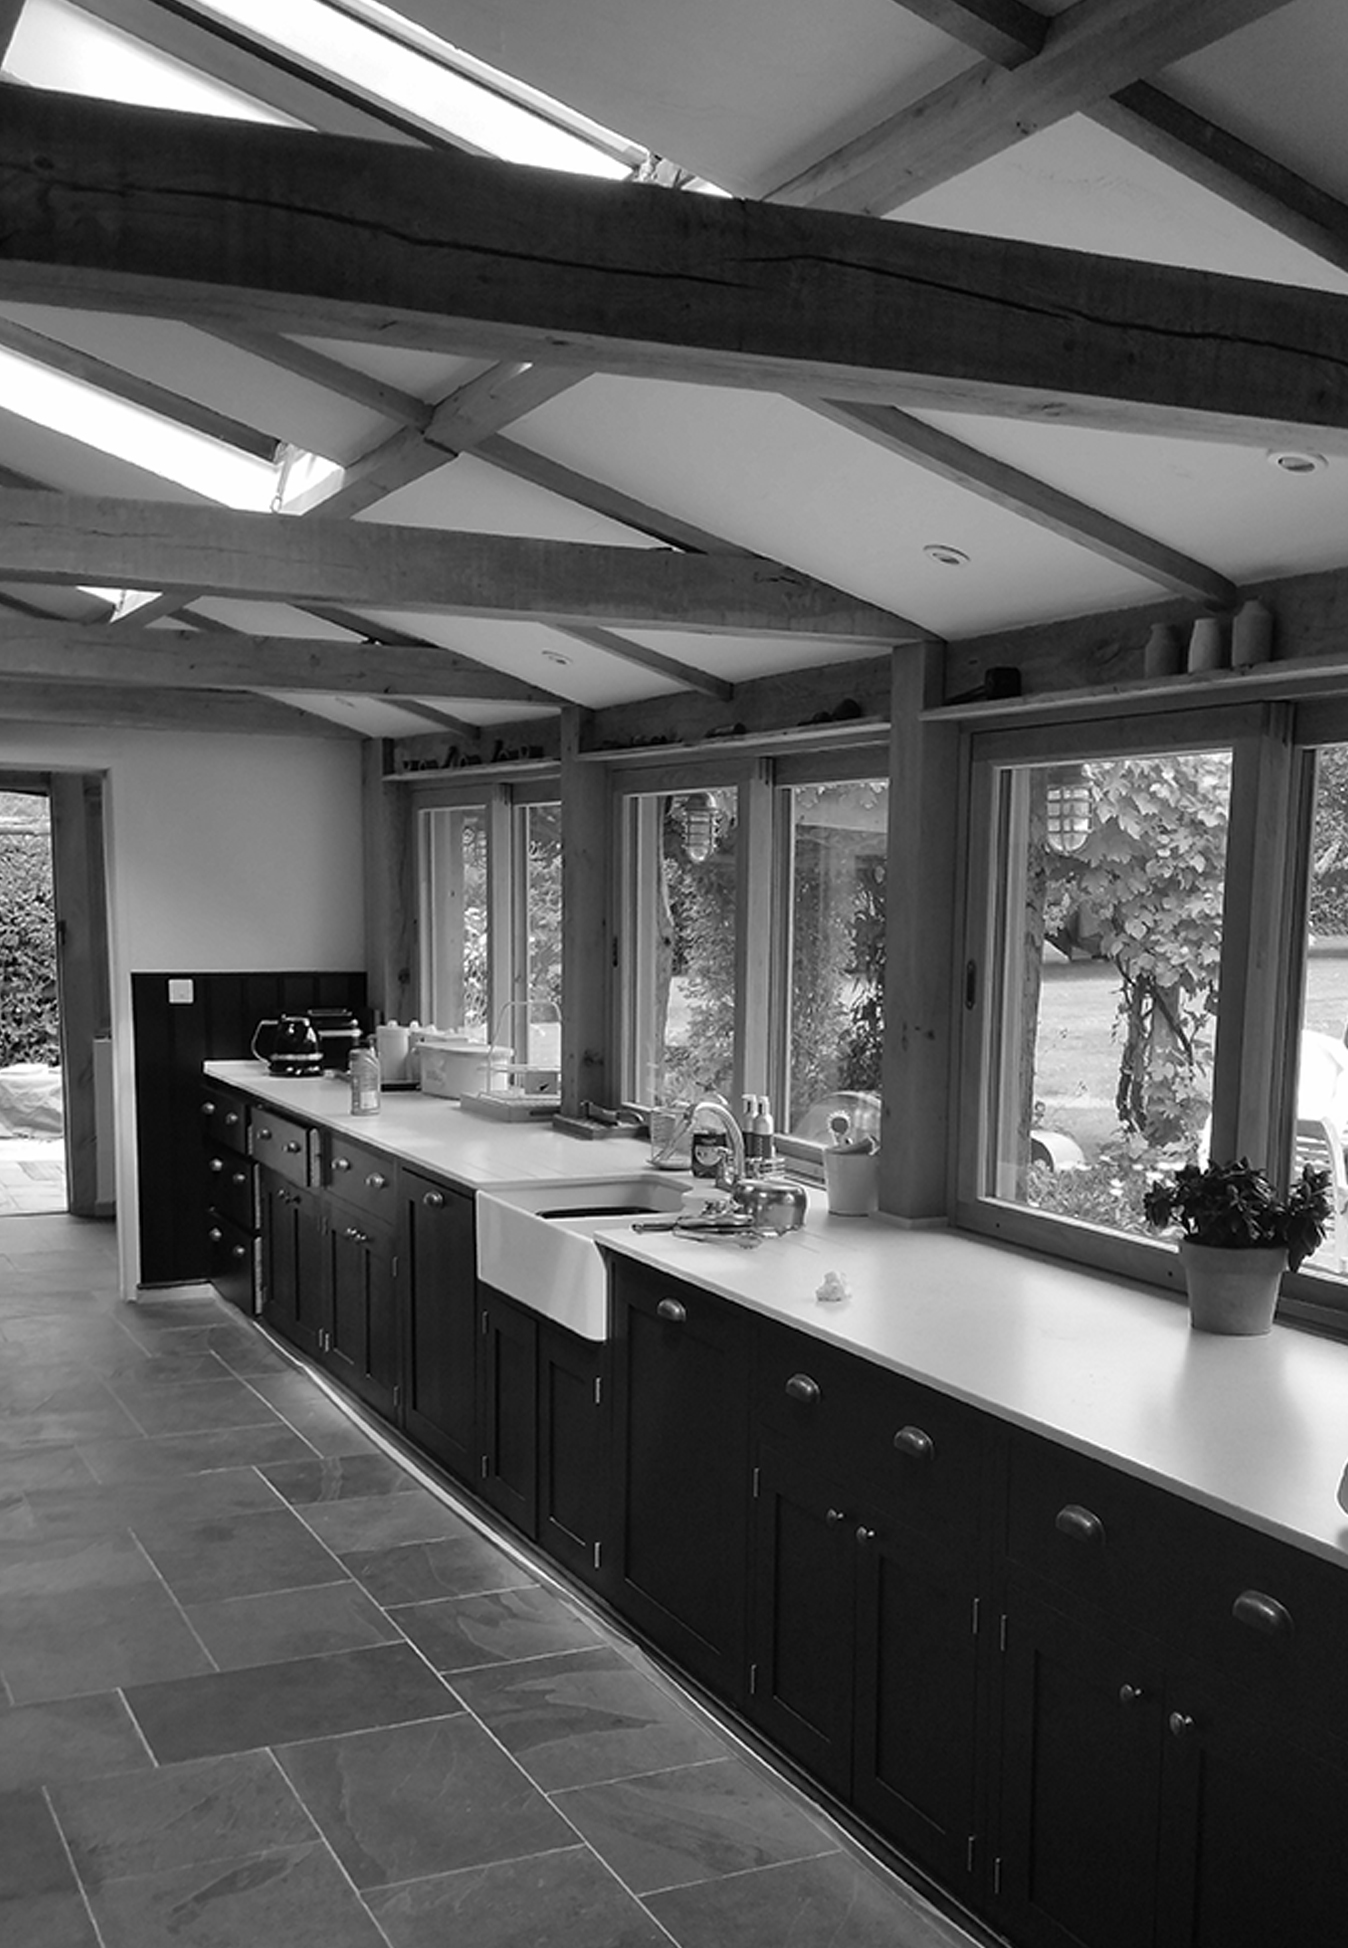 Oak frame kitchen interior